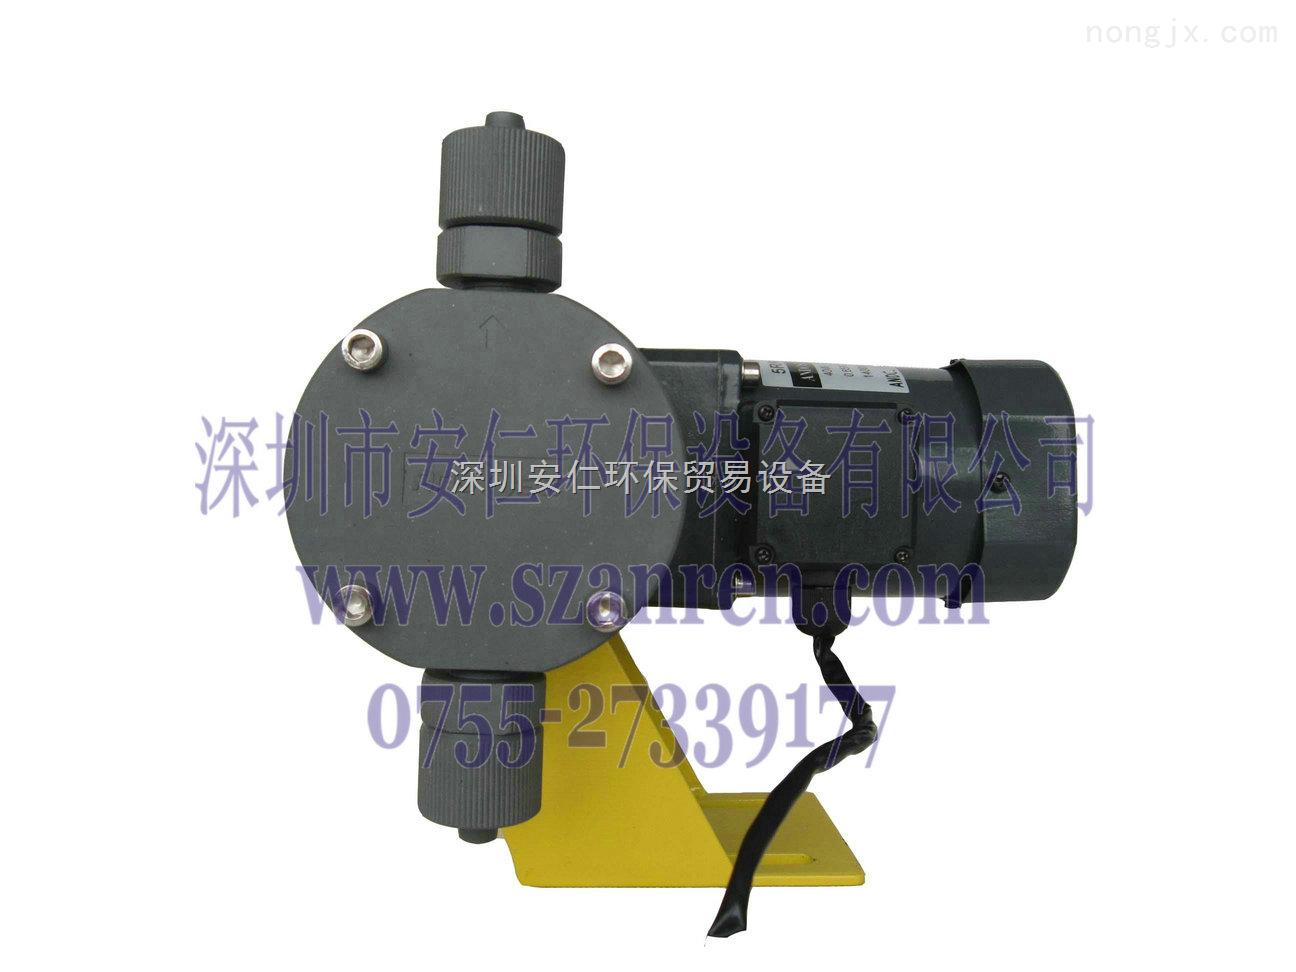 P086-368TI-原装米顿罗计量泵P086-368TI投药泵质量保证 库存商